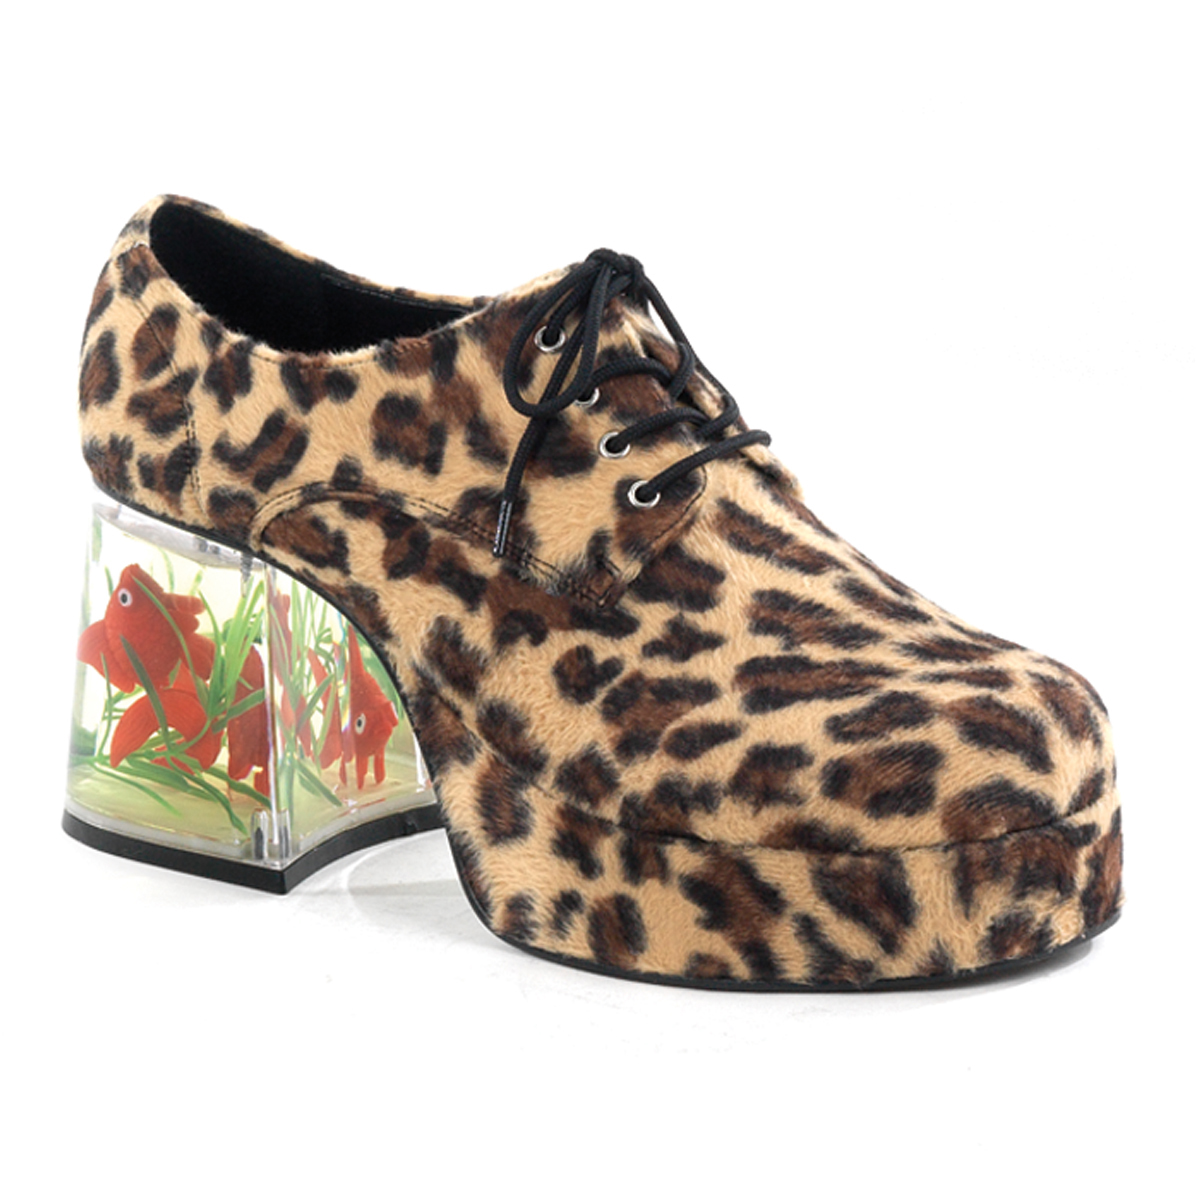 sports shoes 369b7 f1f82 Herren Plateauschuhe PIMP-02 - Leopard